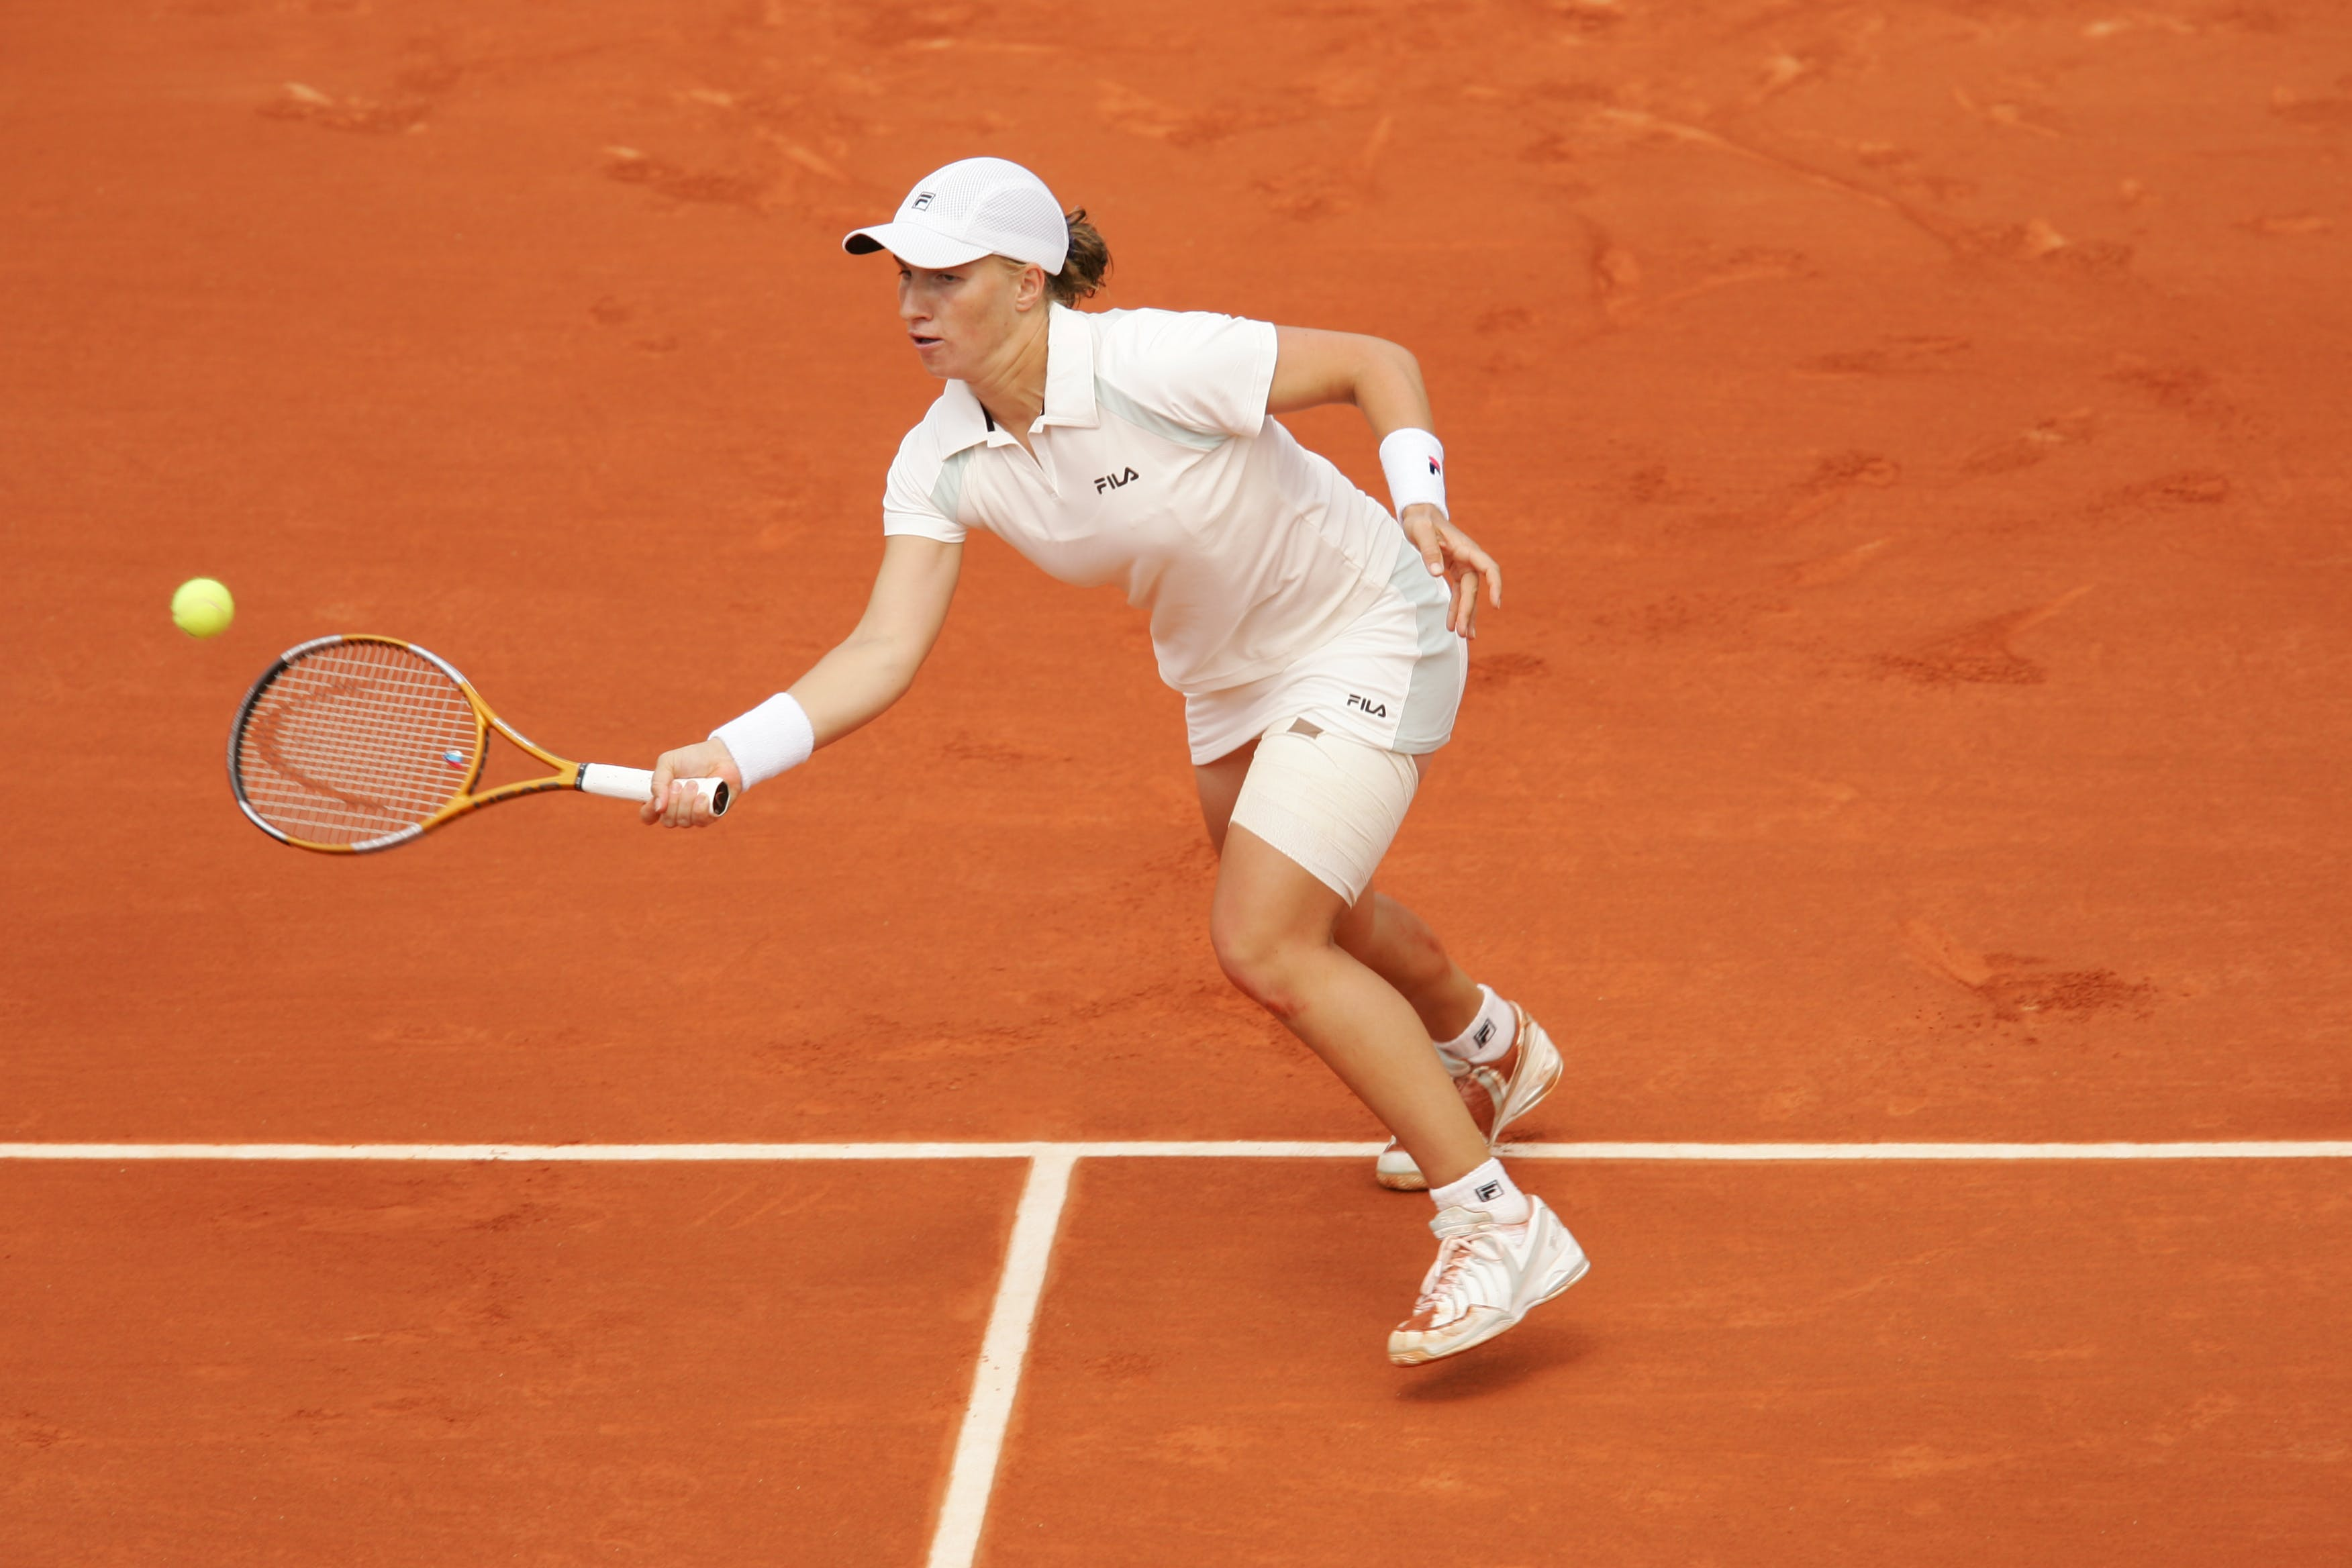 Svetlana Kuznetsova Roland-Garros 2005